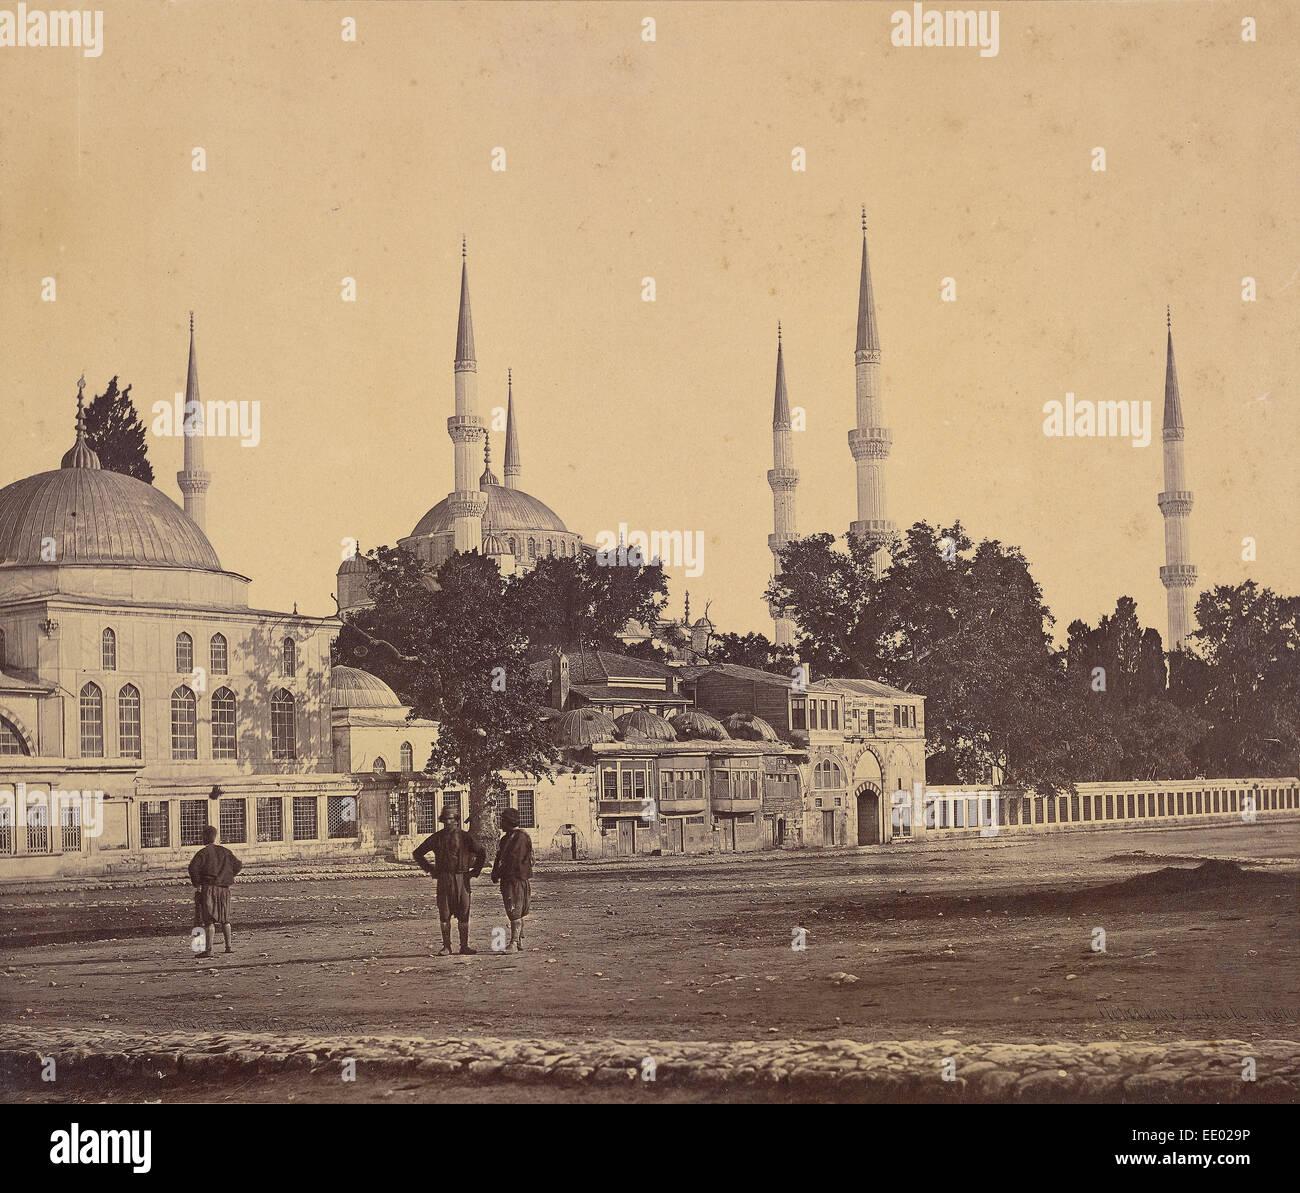 Sultan Ahmed's Mosque; Felice Beato, English, born Italy, 1832 - 1909, James Robertson, English, 1813 - 1888; - Stock Image